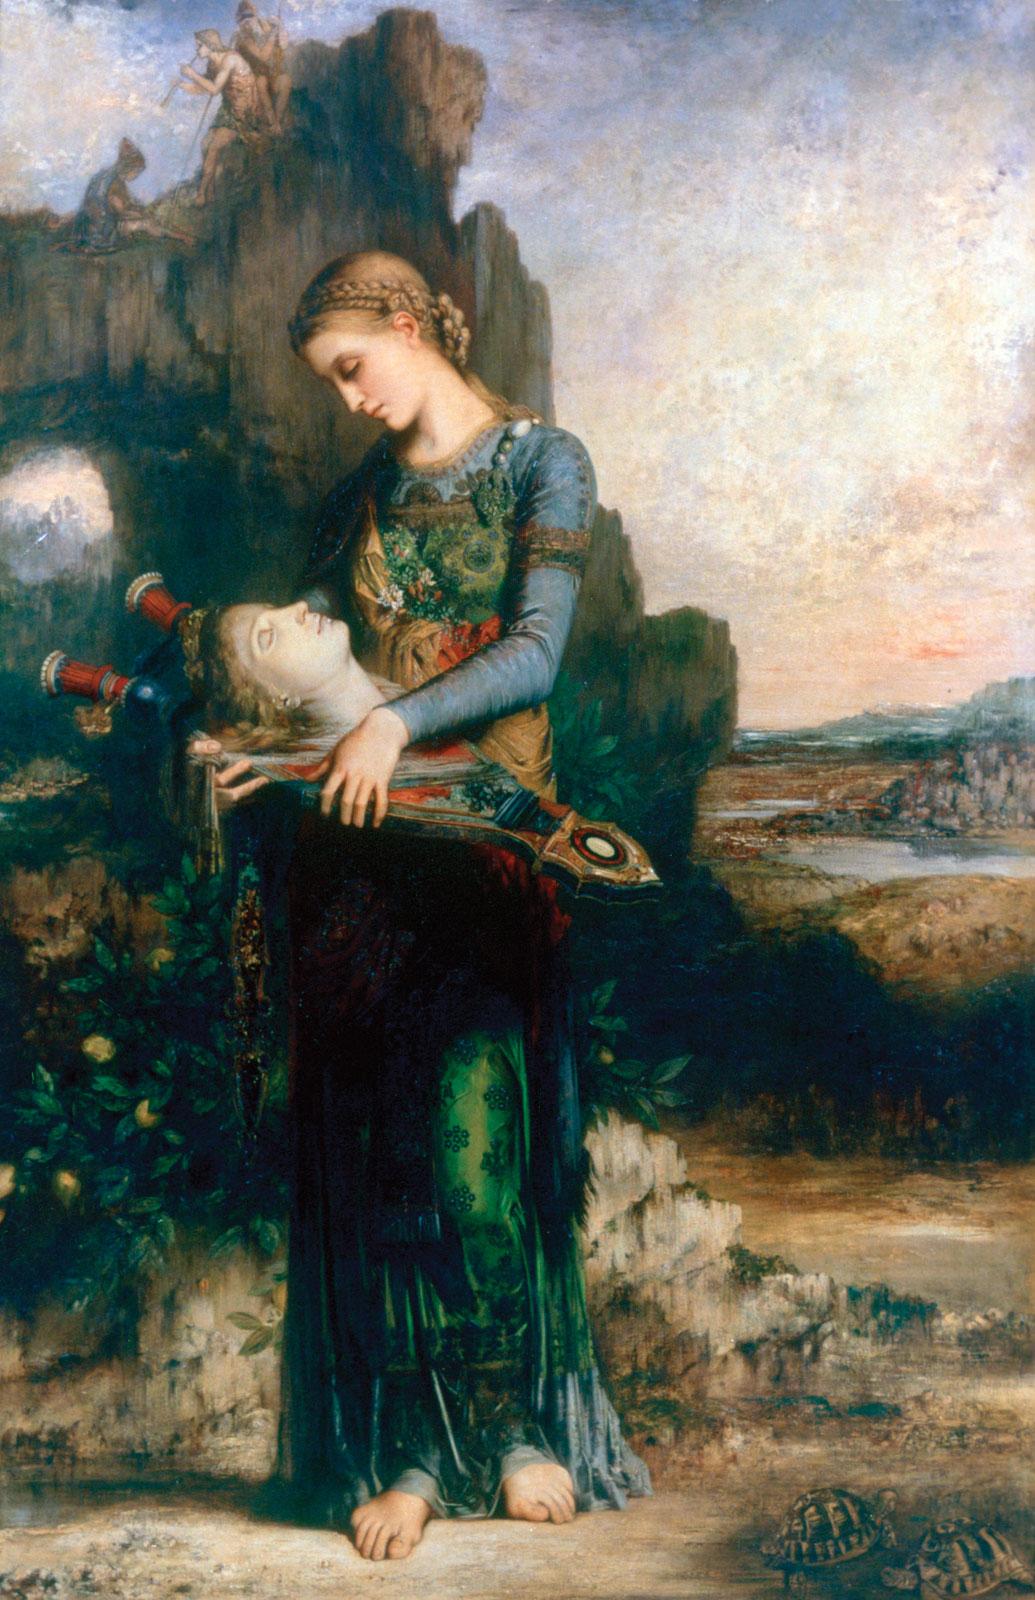 oil-Orpheus-wood-Gustave-Moreau-Musee-dOrsay-1865.jpg